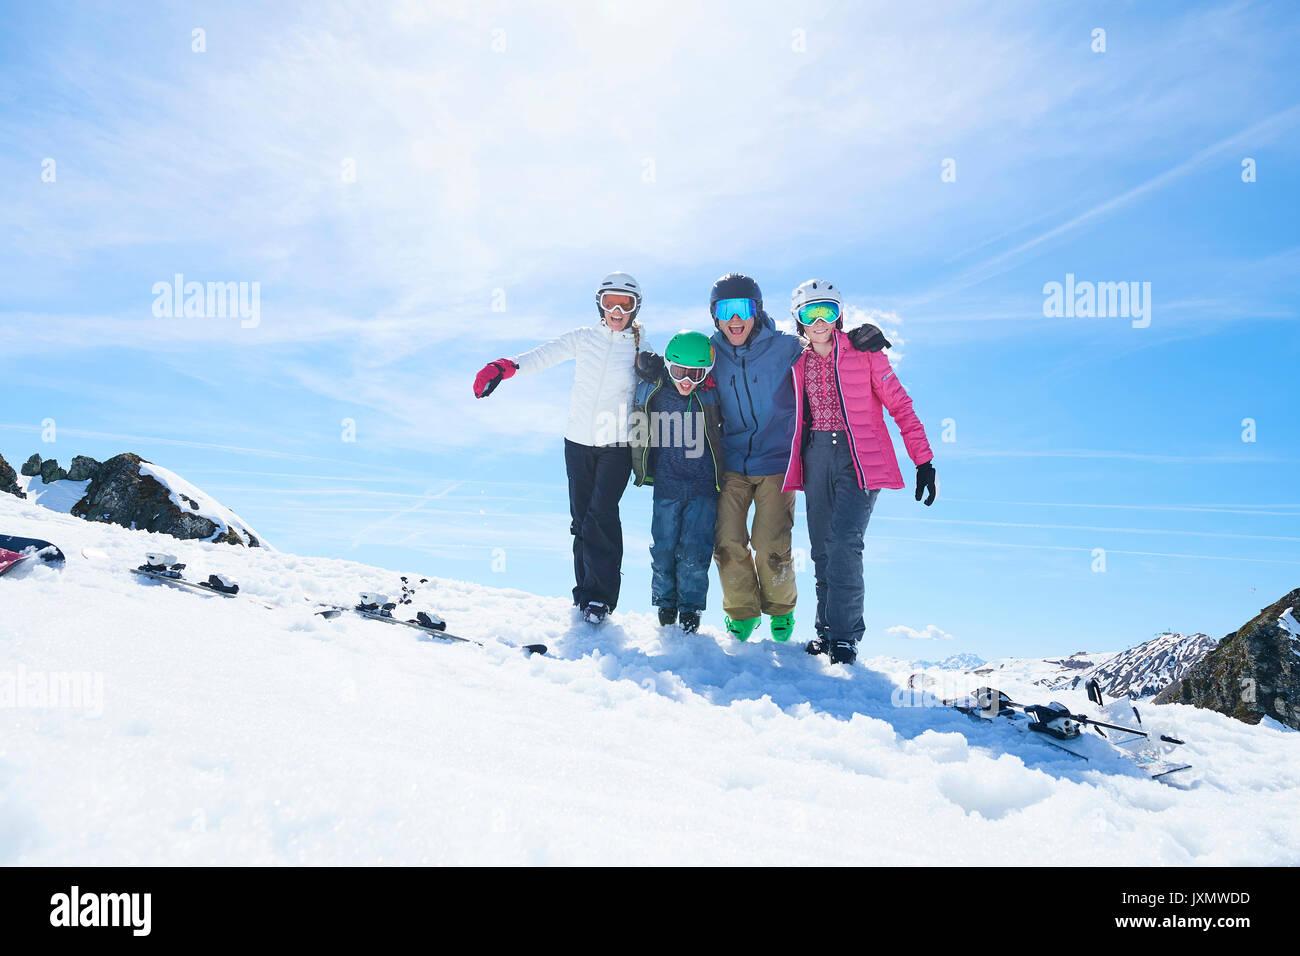 Vacaciones de esquí en familia, Mijdrecht, Tirol, Austria Imagen De Stock